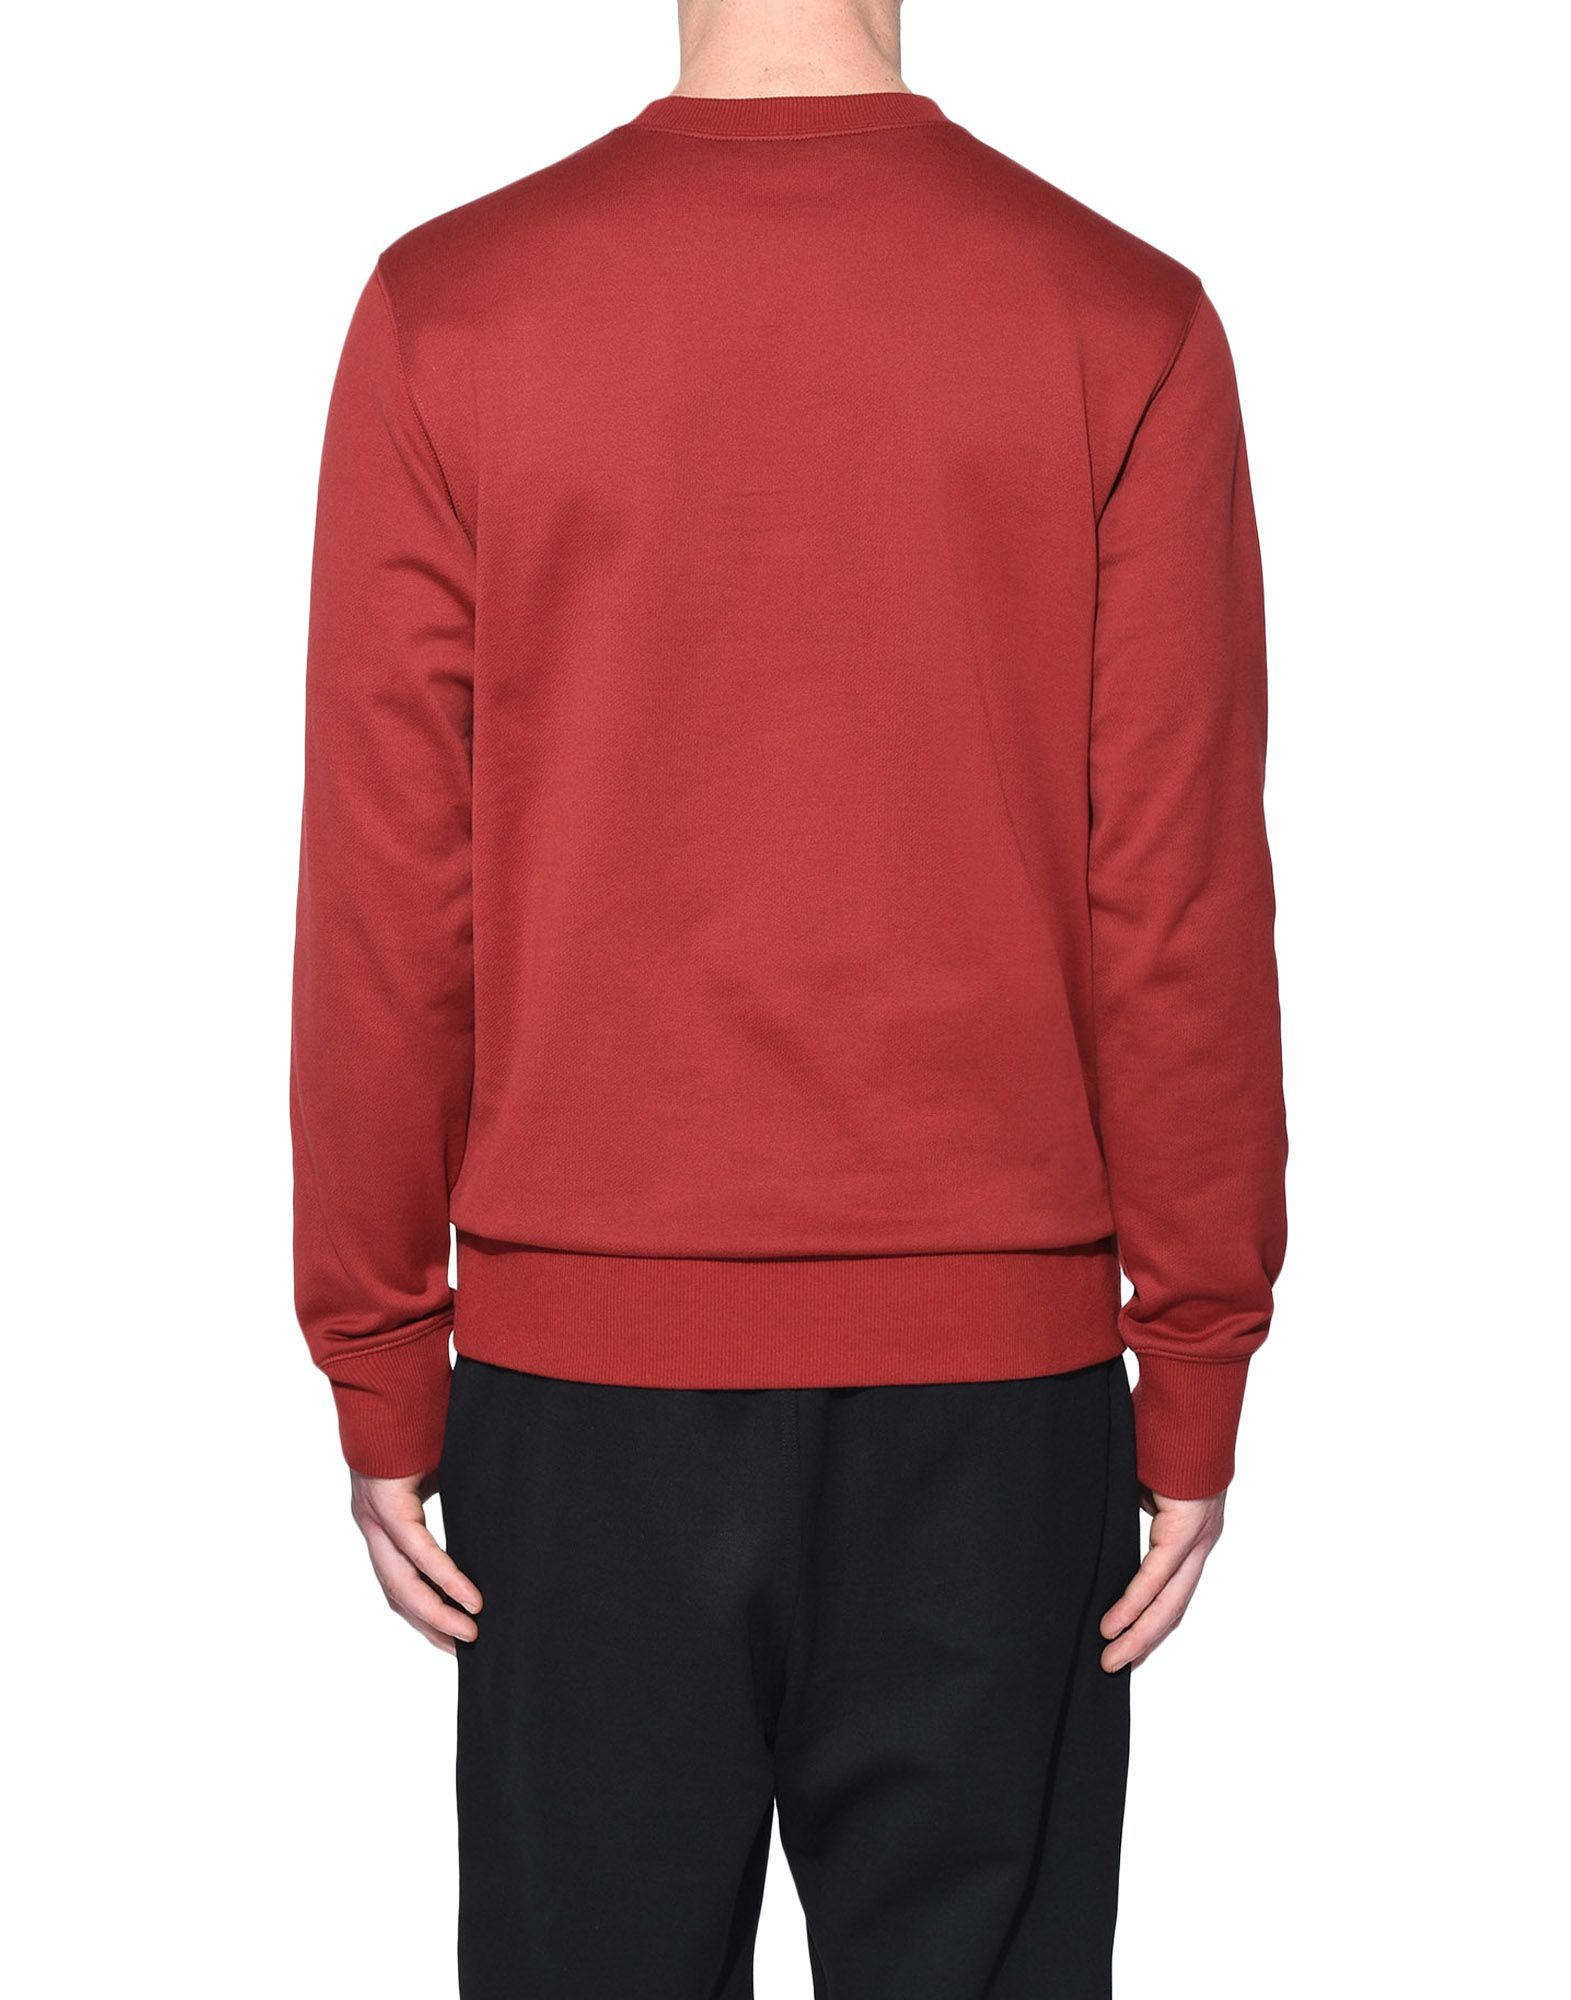 Y-3 Y-3 Classic Sweater Sweatshirt Man d